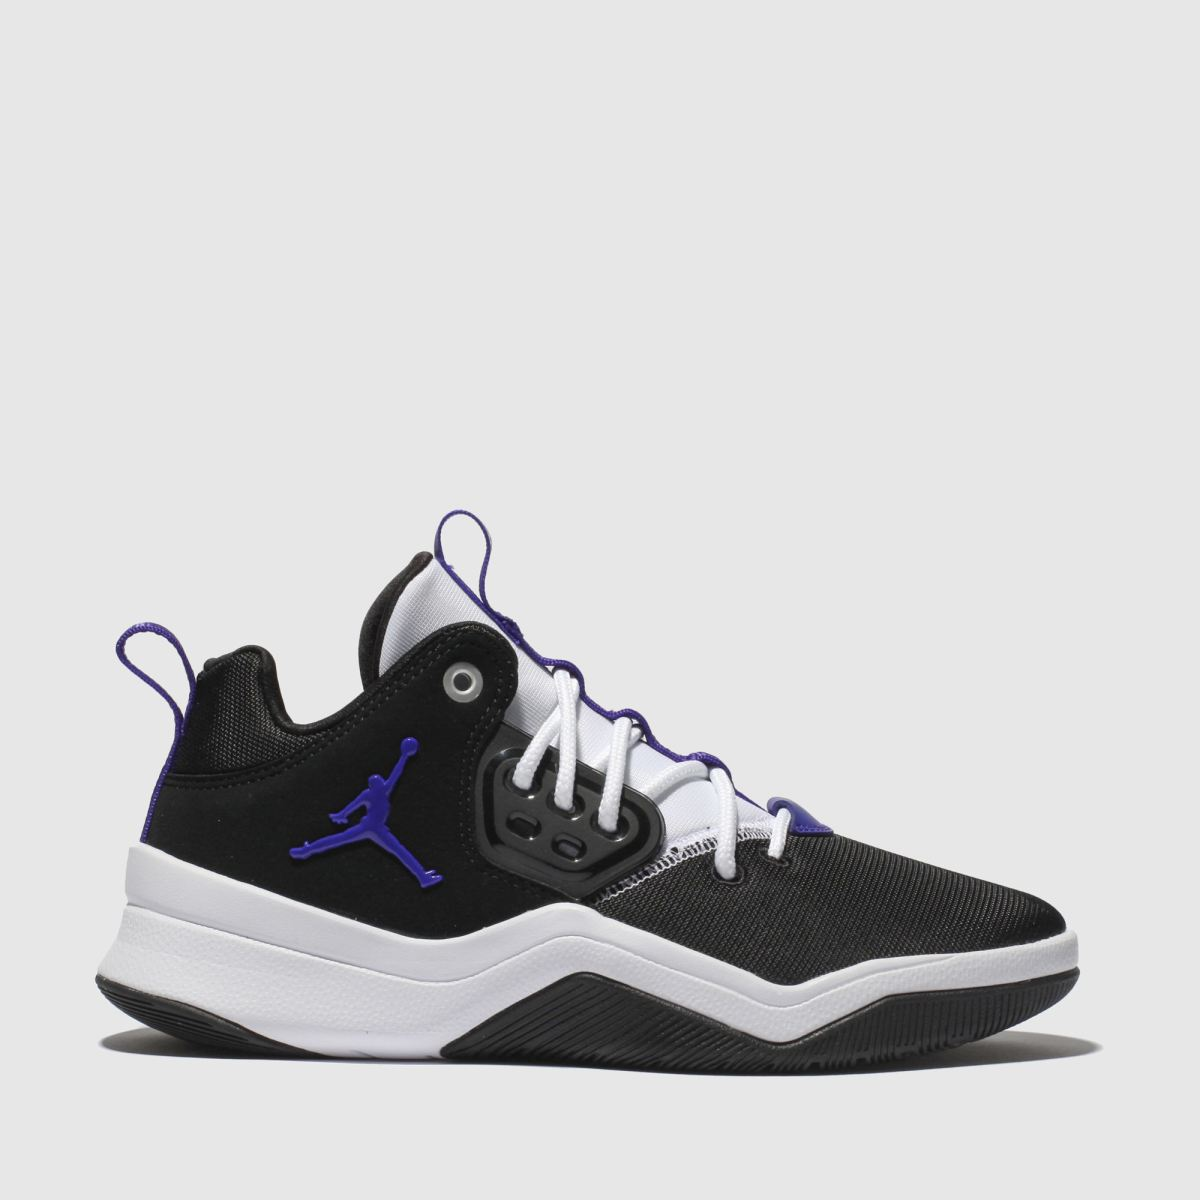 Nike Jordan Black & Purple Jordan Dna Trainers Youth